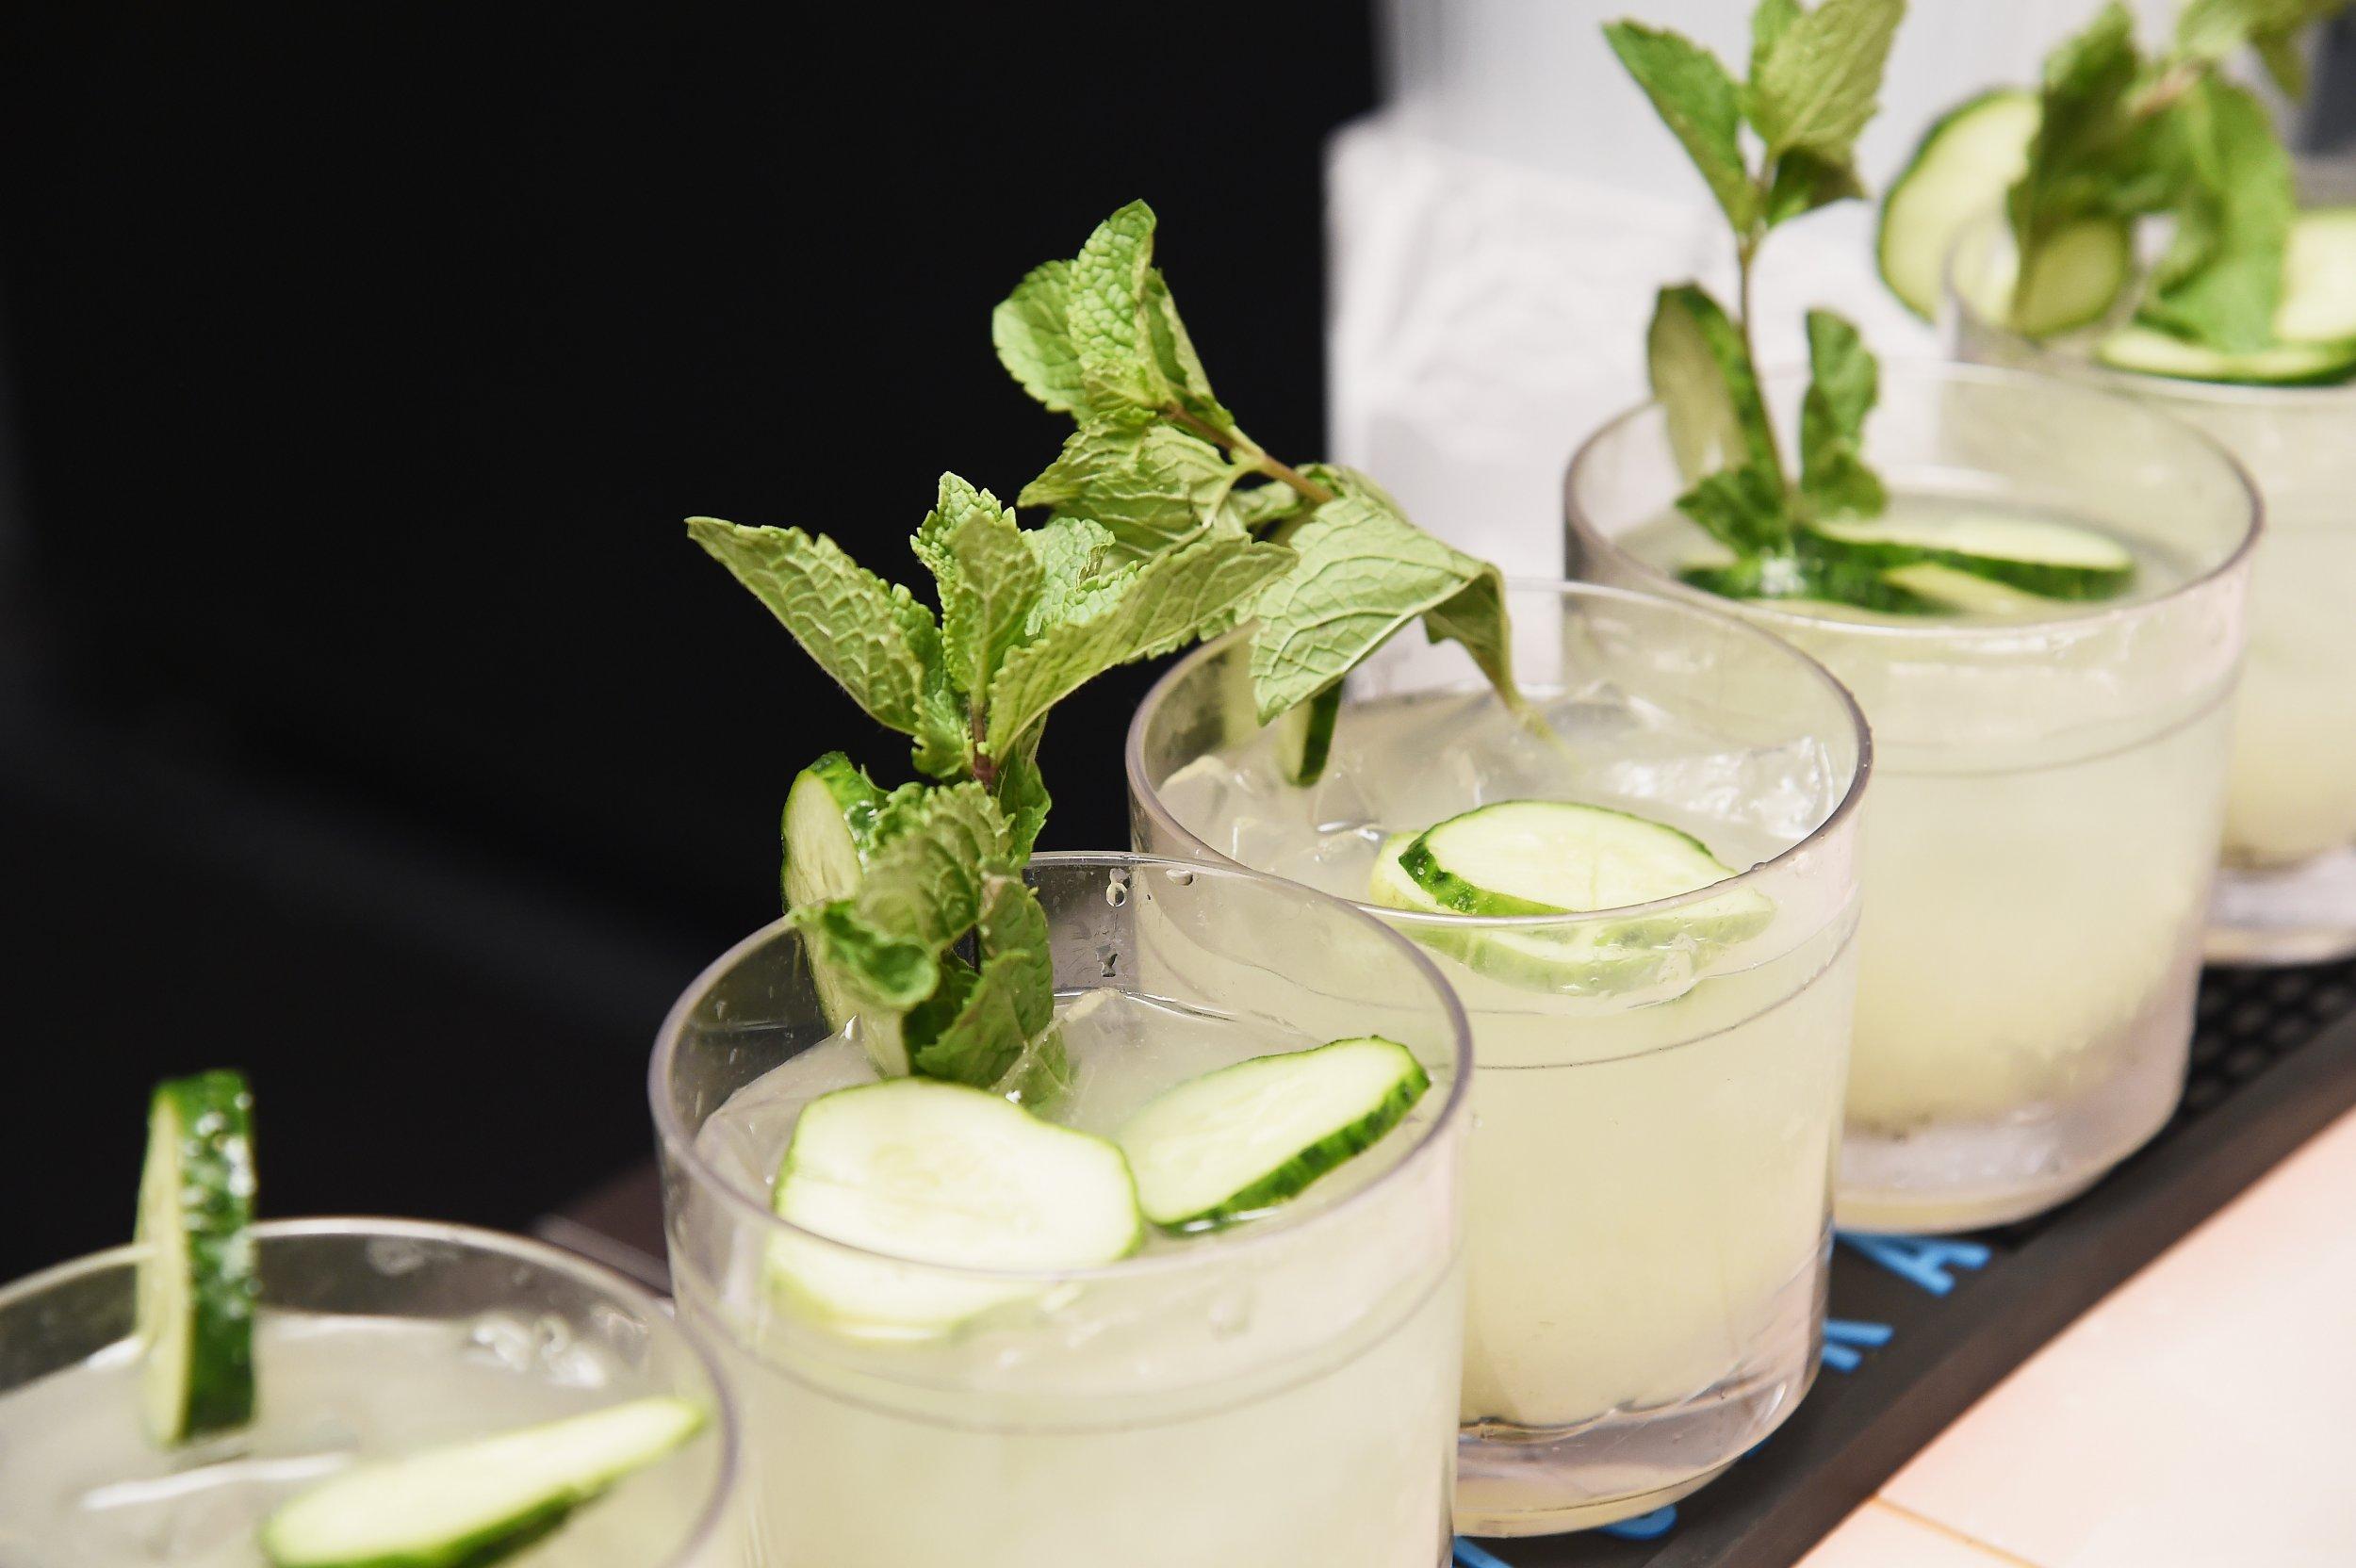 10_03_vodka drinks_01